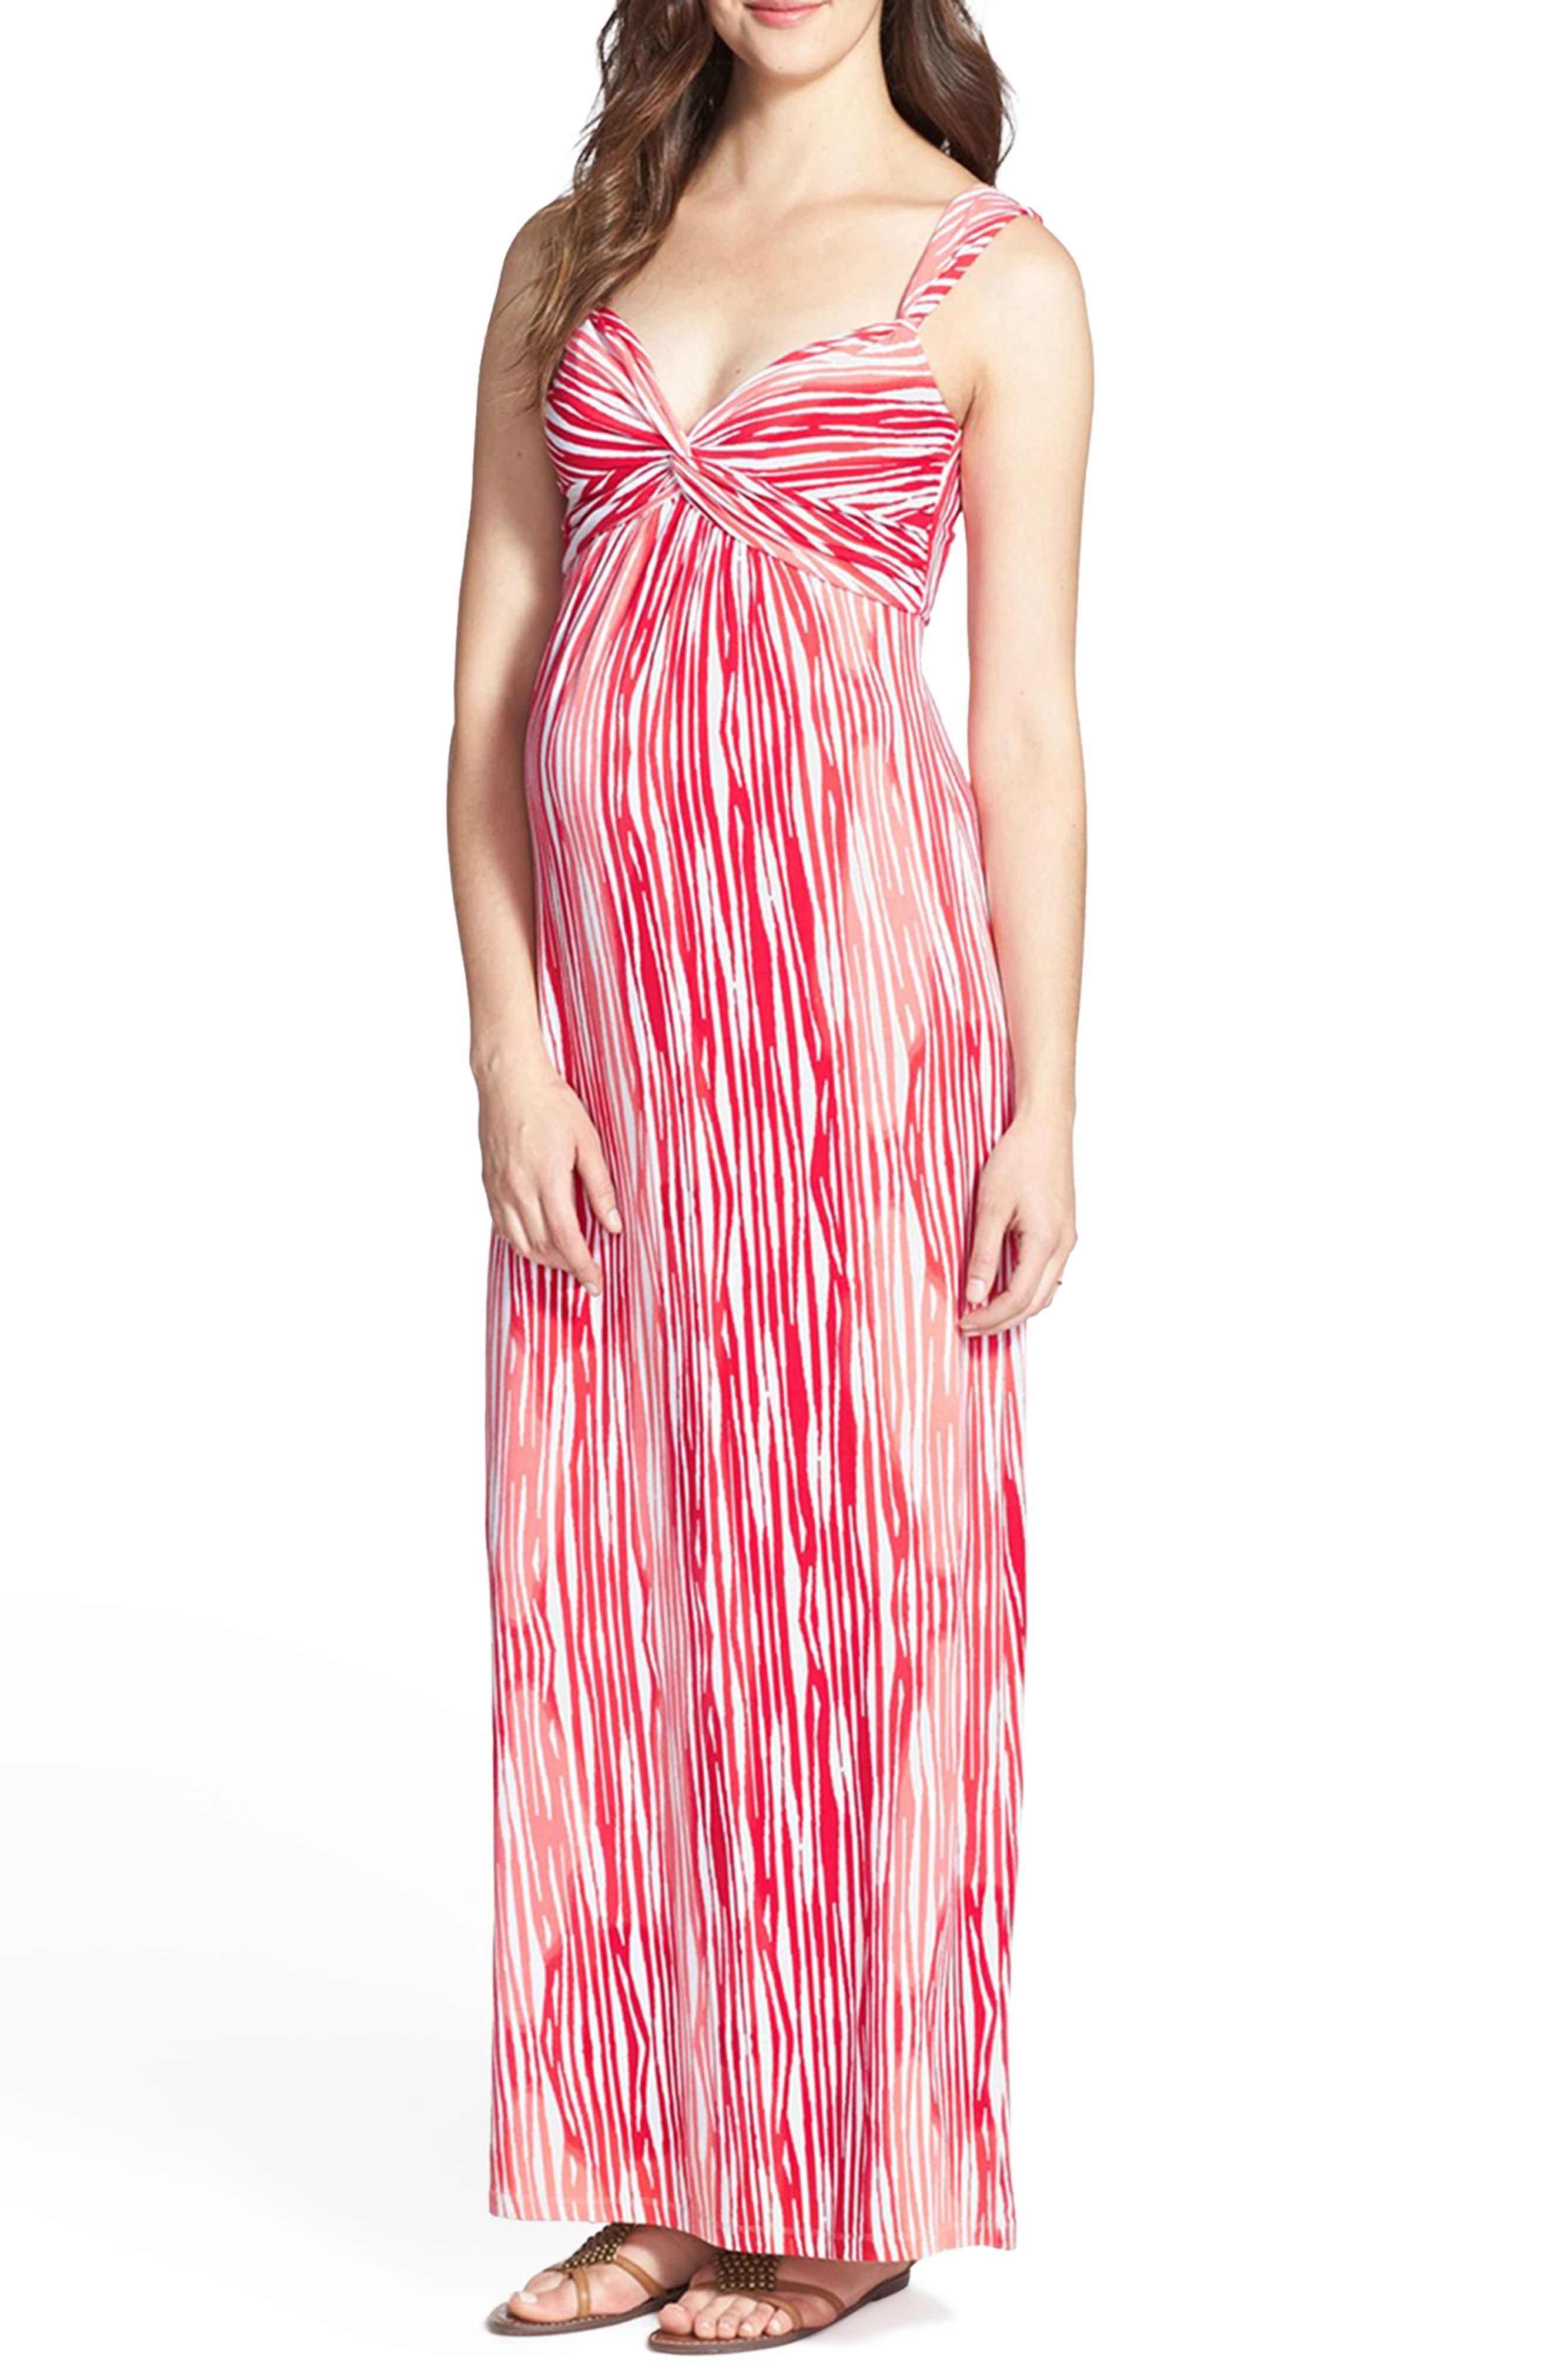 'Callie' Jersey Maxi Maternity Dress,                         Main,                         color, Coral Brush Stripe